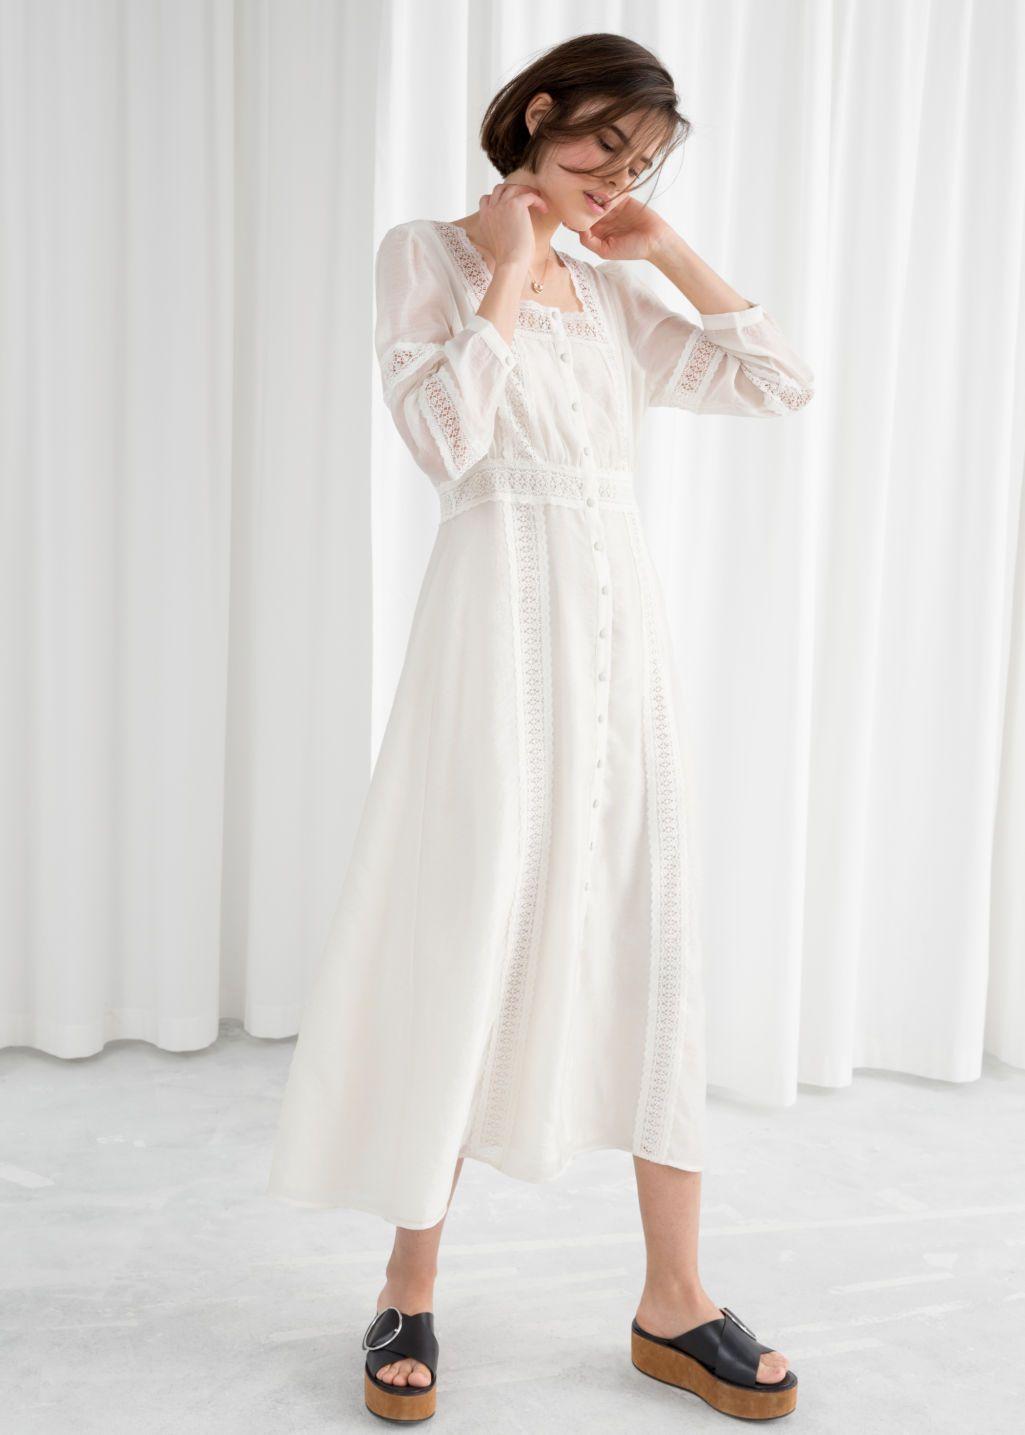 Lace Midi Dress White Midi Dresses Other Stories Us Lace White Dress Lace Midi Dress Stylish White Dress